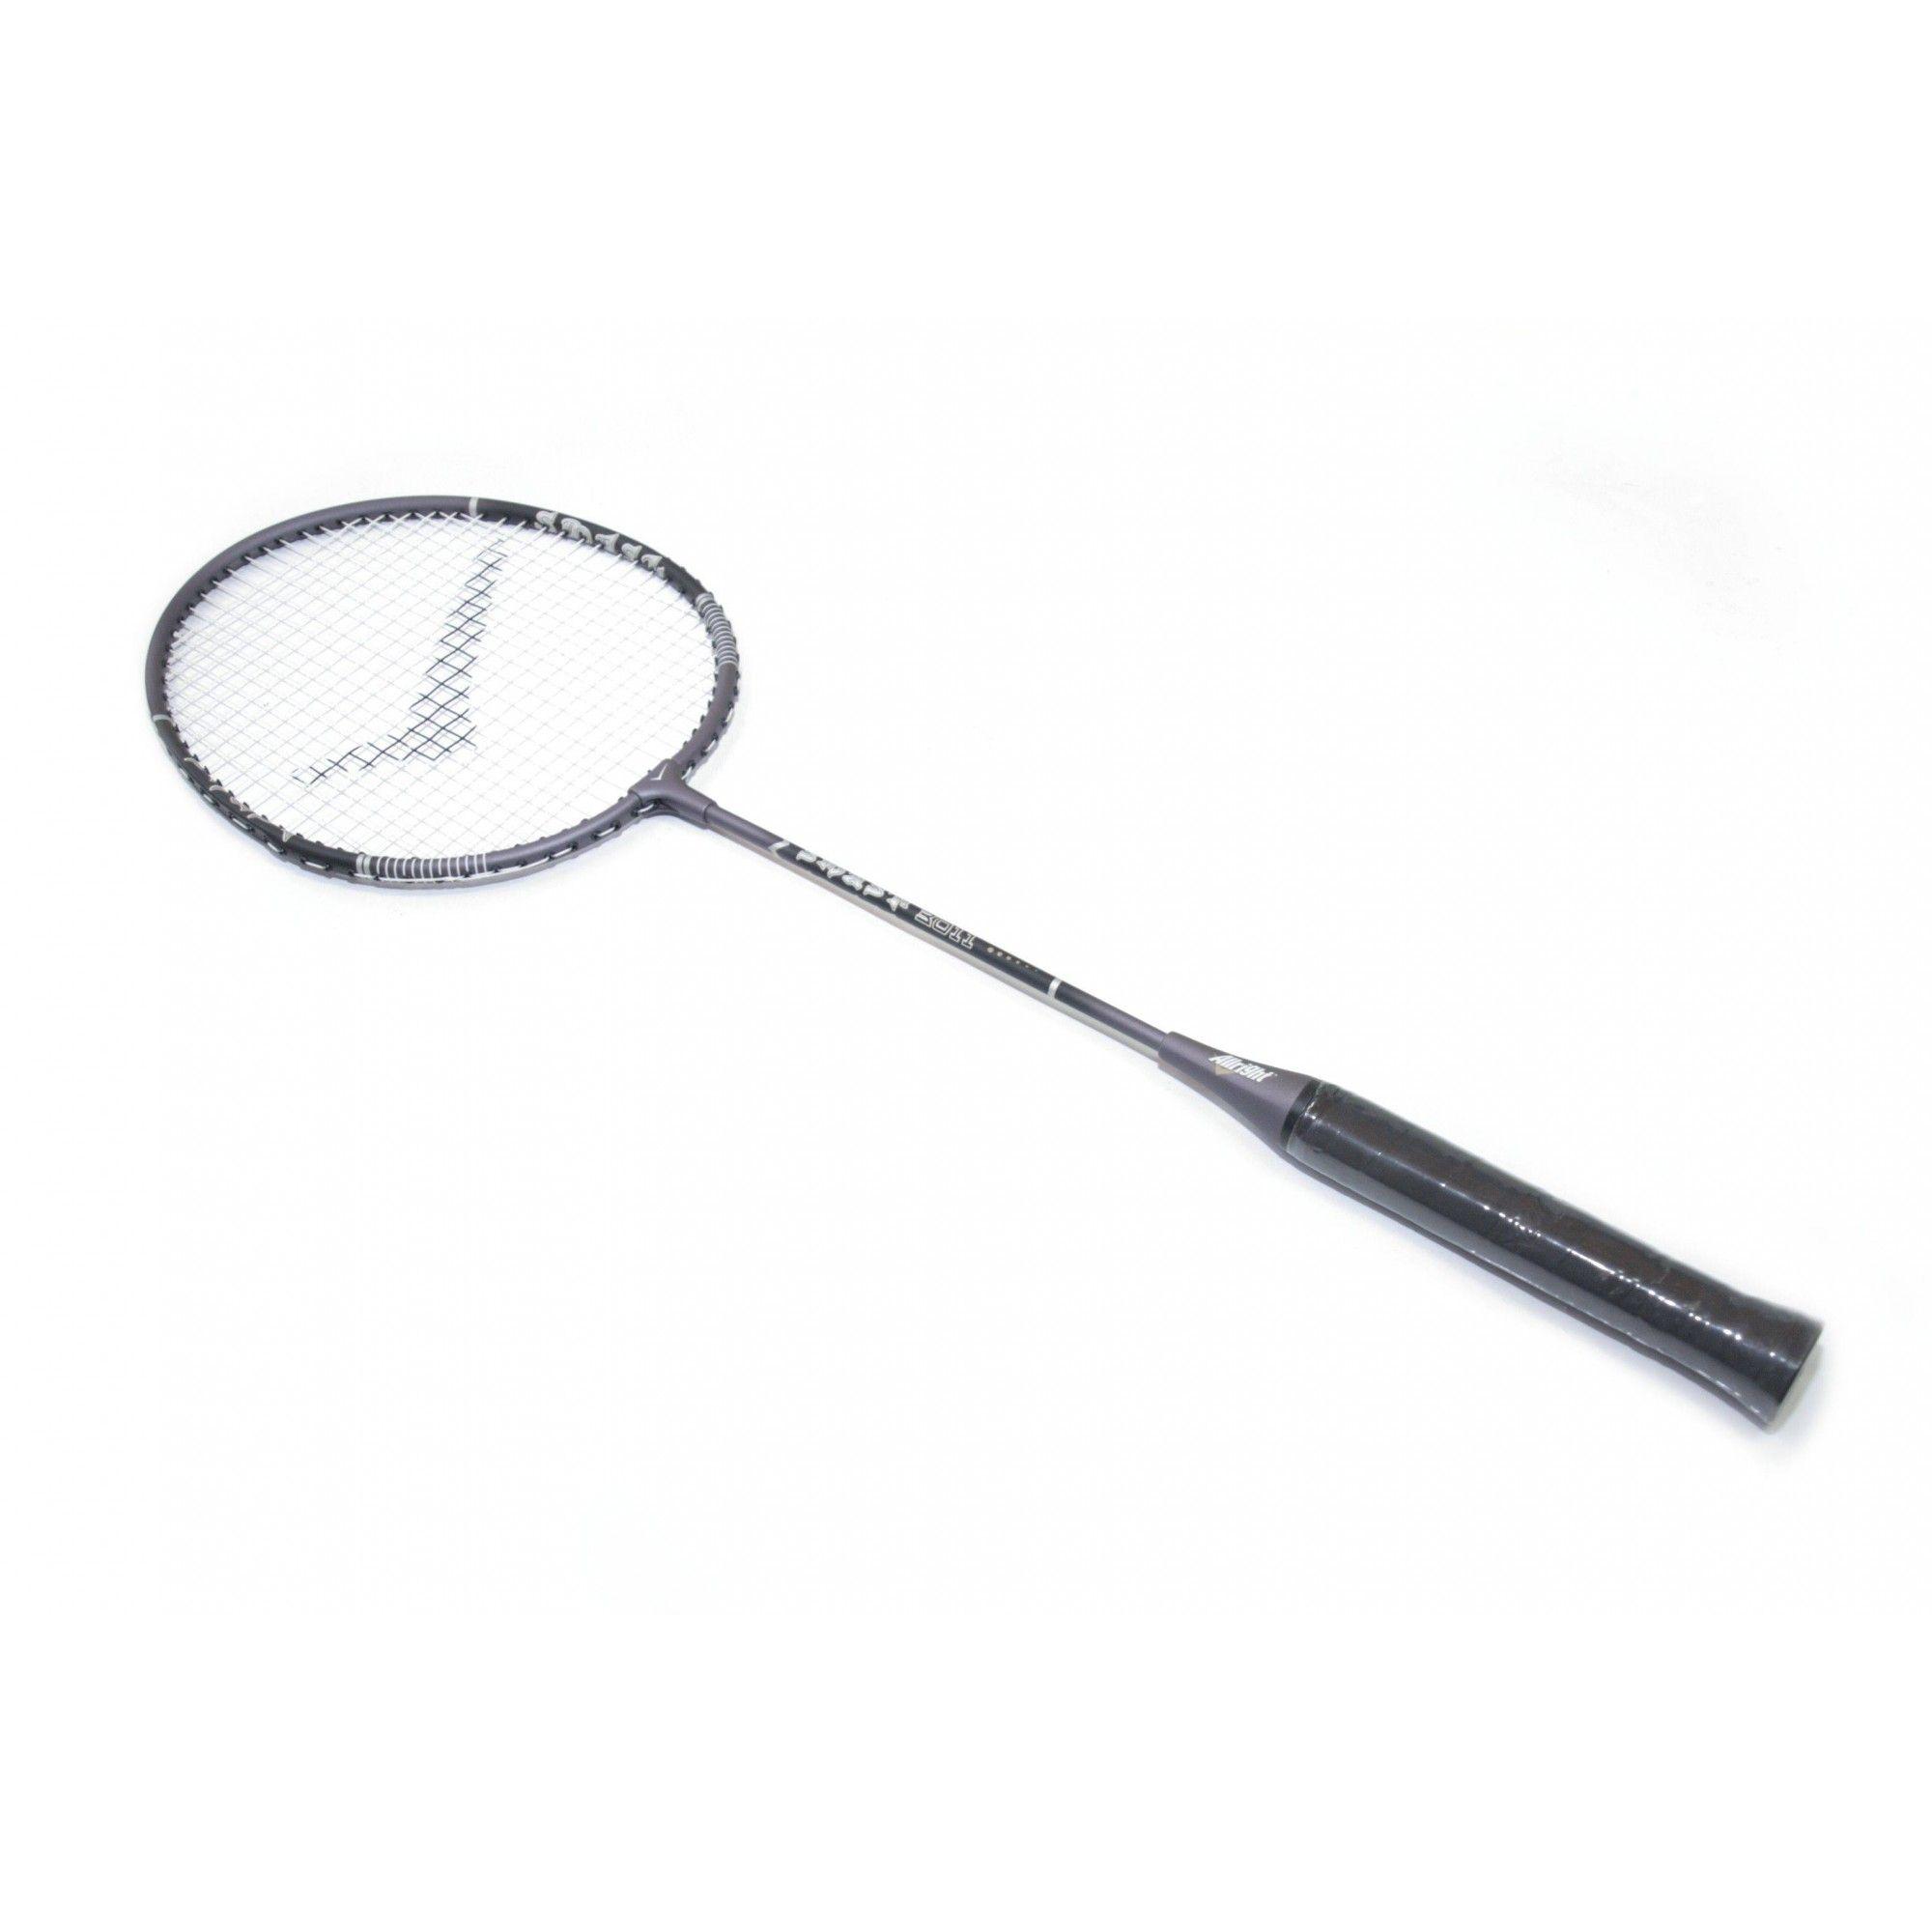 Rakieta badminton Allright Smash 3011 ALLRIGHT - 1 | klubfitness.pl